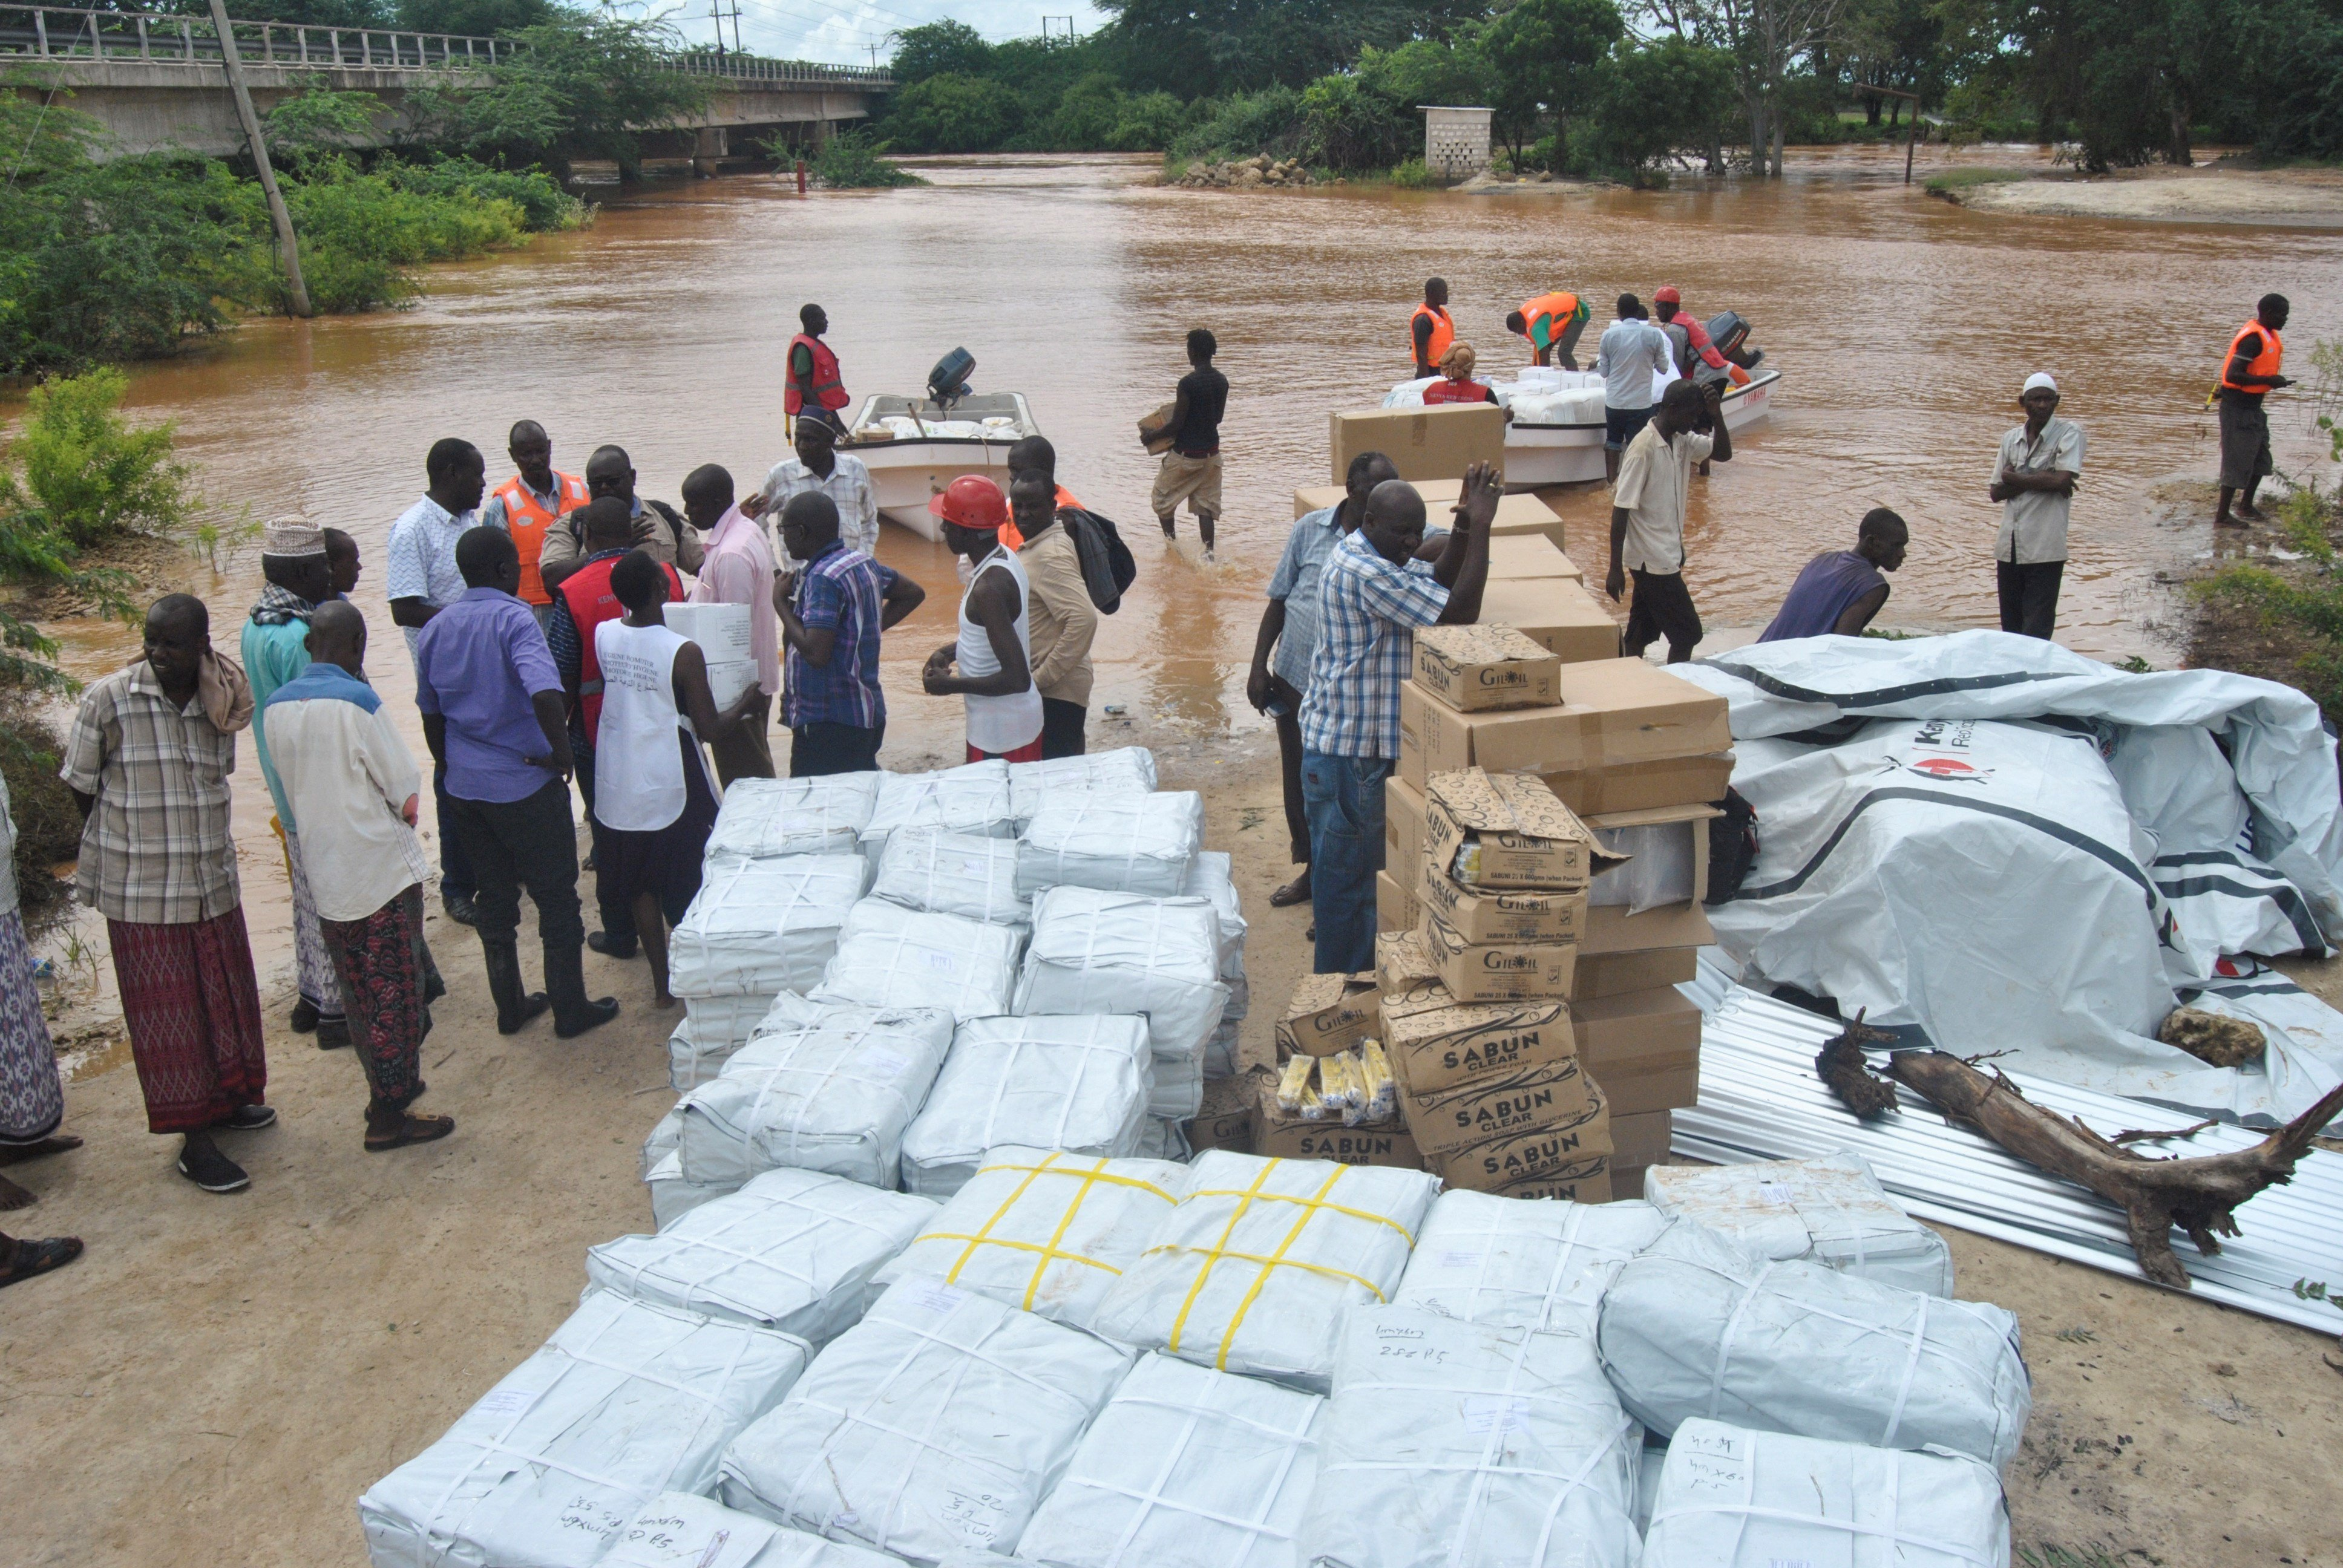 La represa que reventó en Kenia era ilegal, según las autoridades